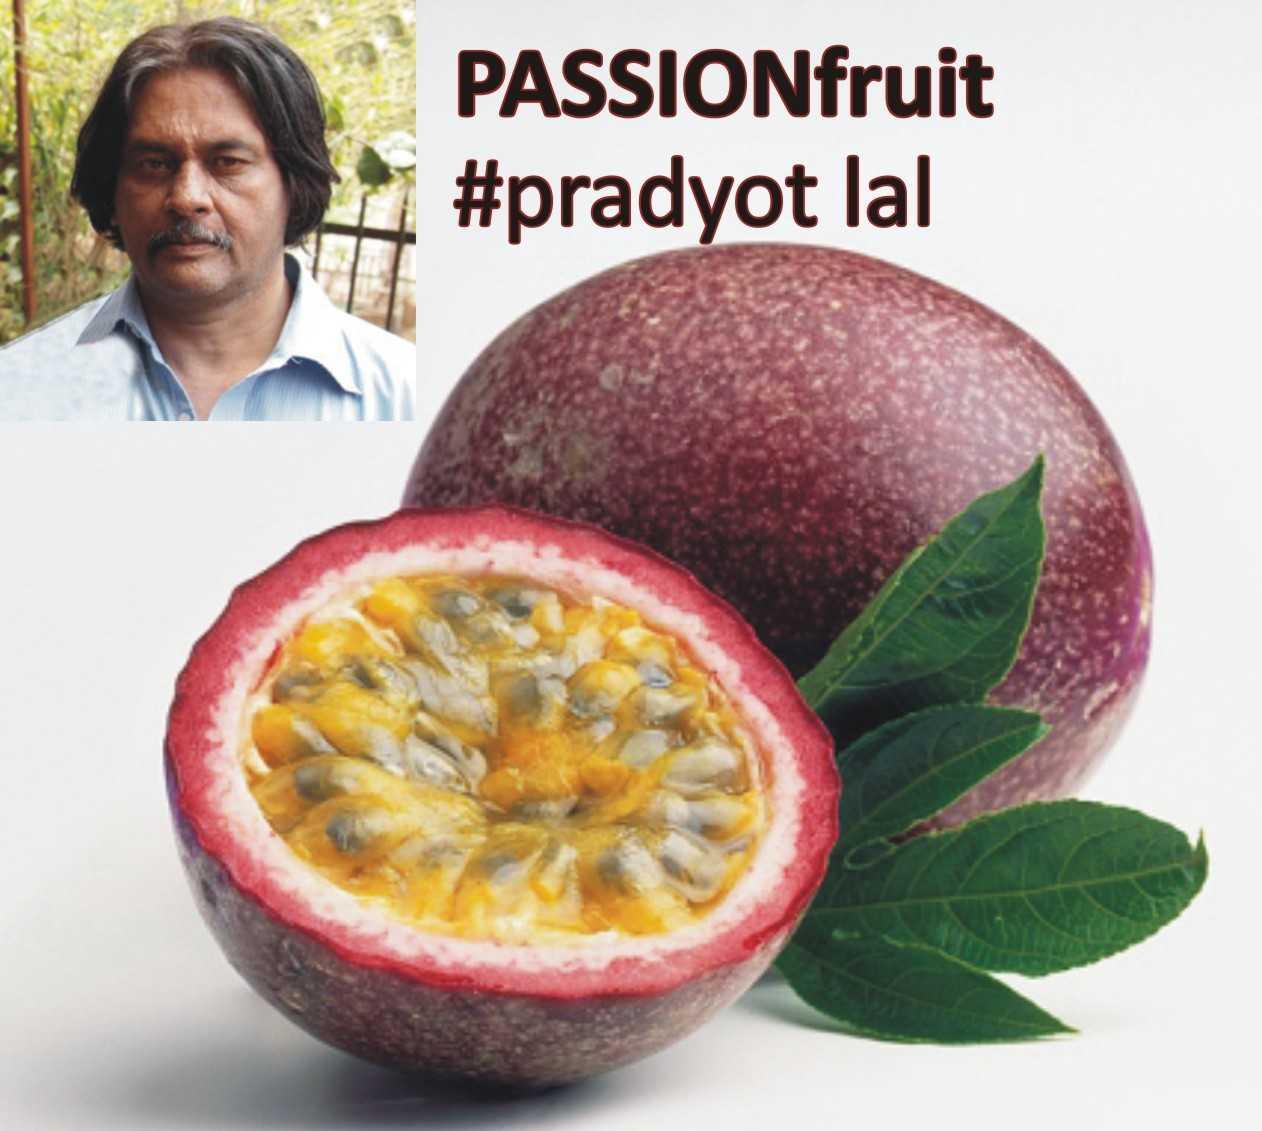 passionfruit by pradyot lal-fnbworld